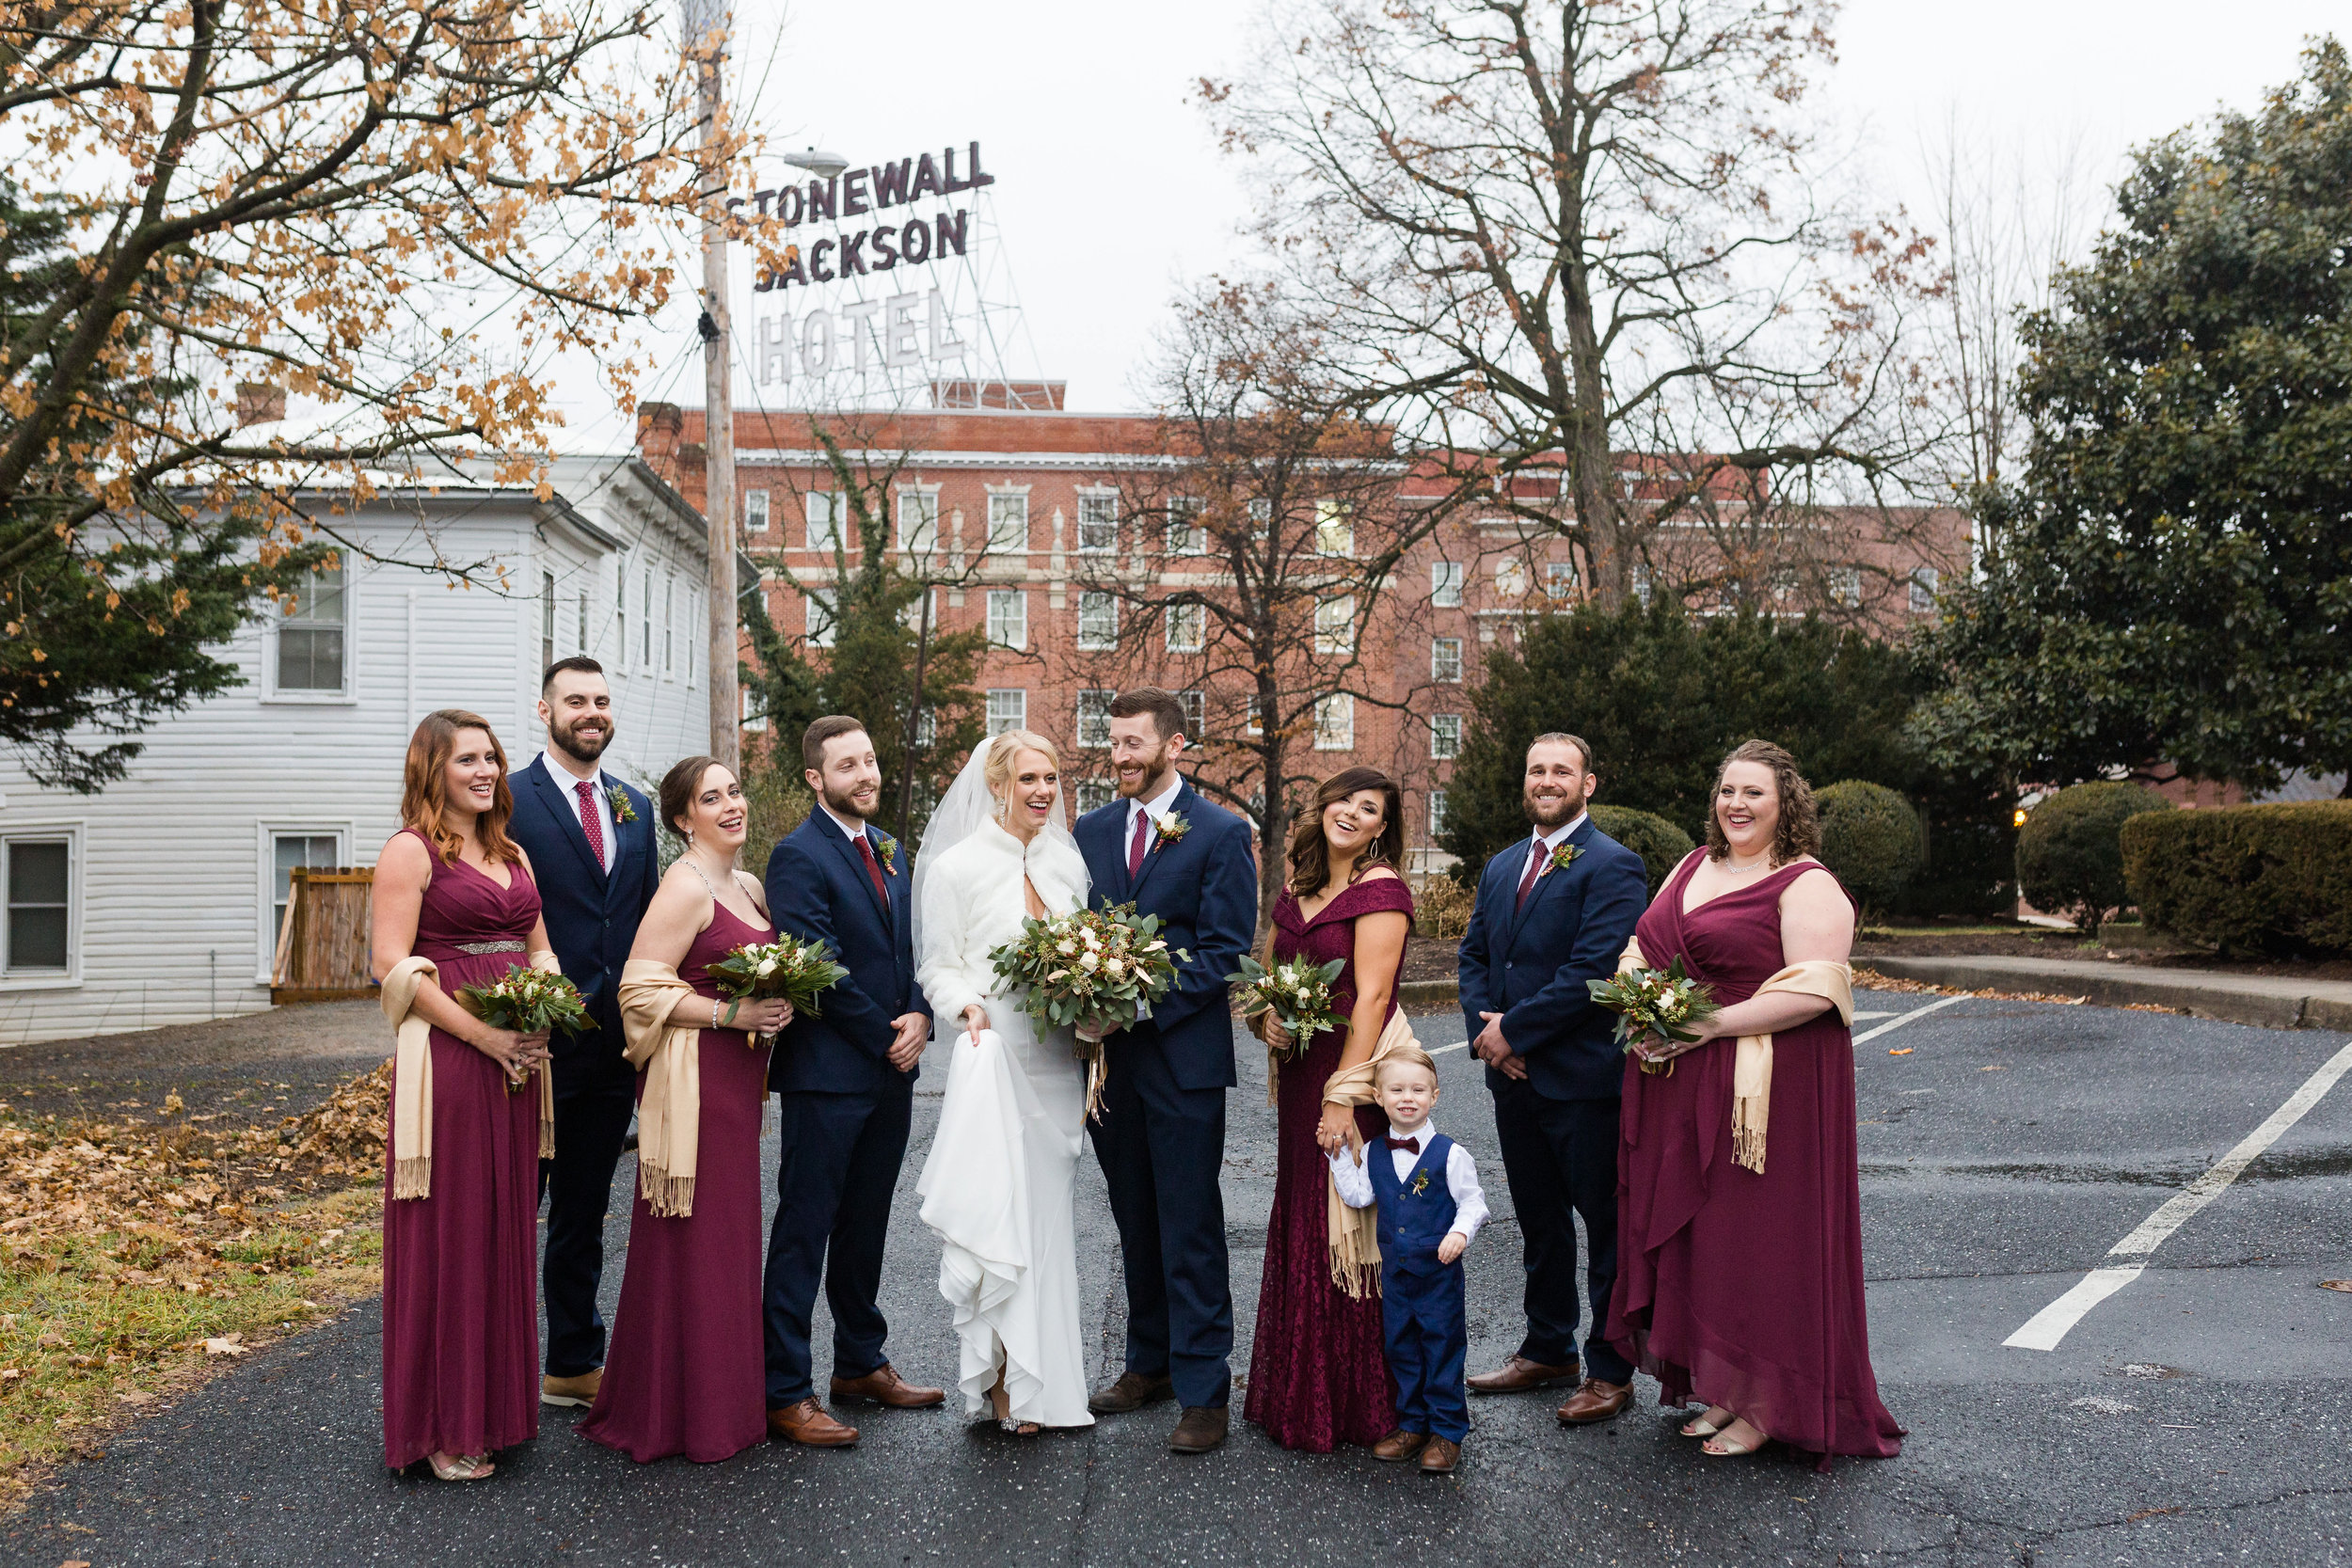 stonewall jackson wedding-67.jpg